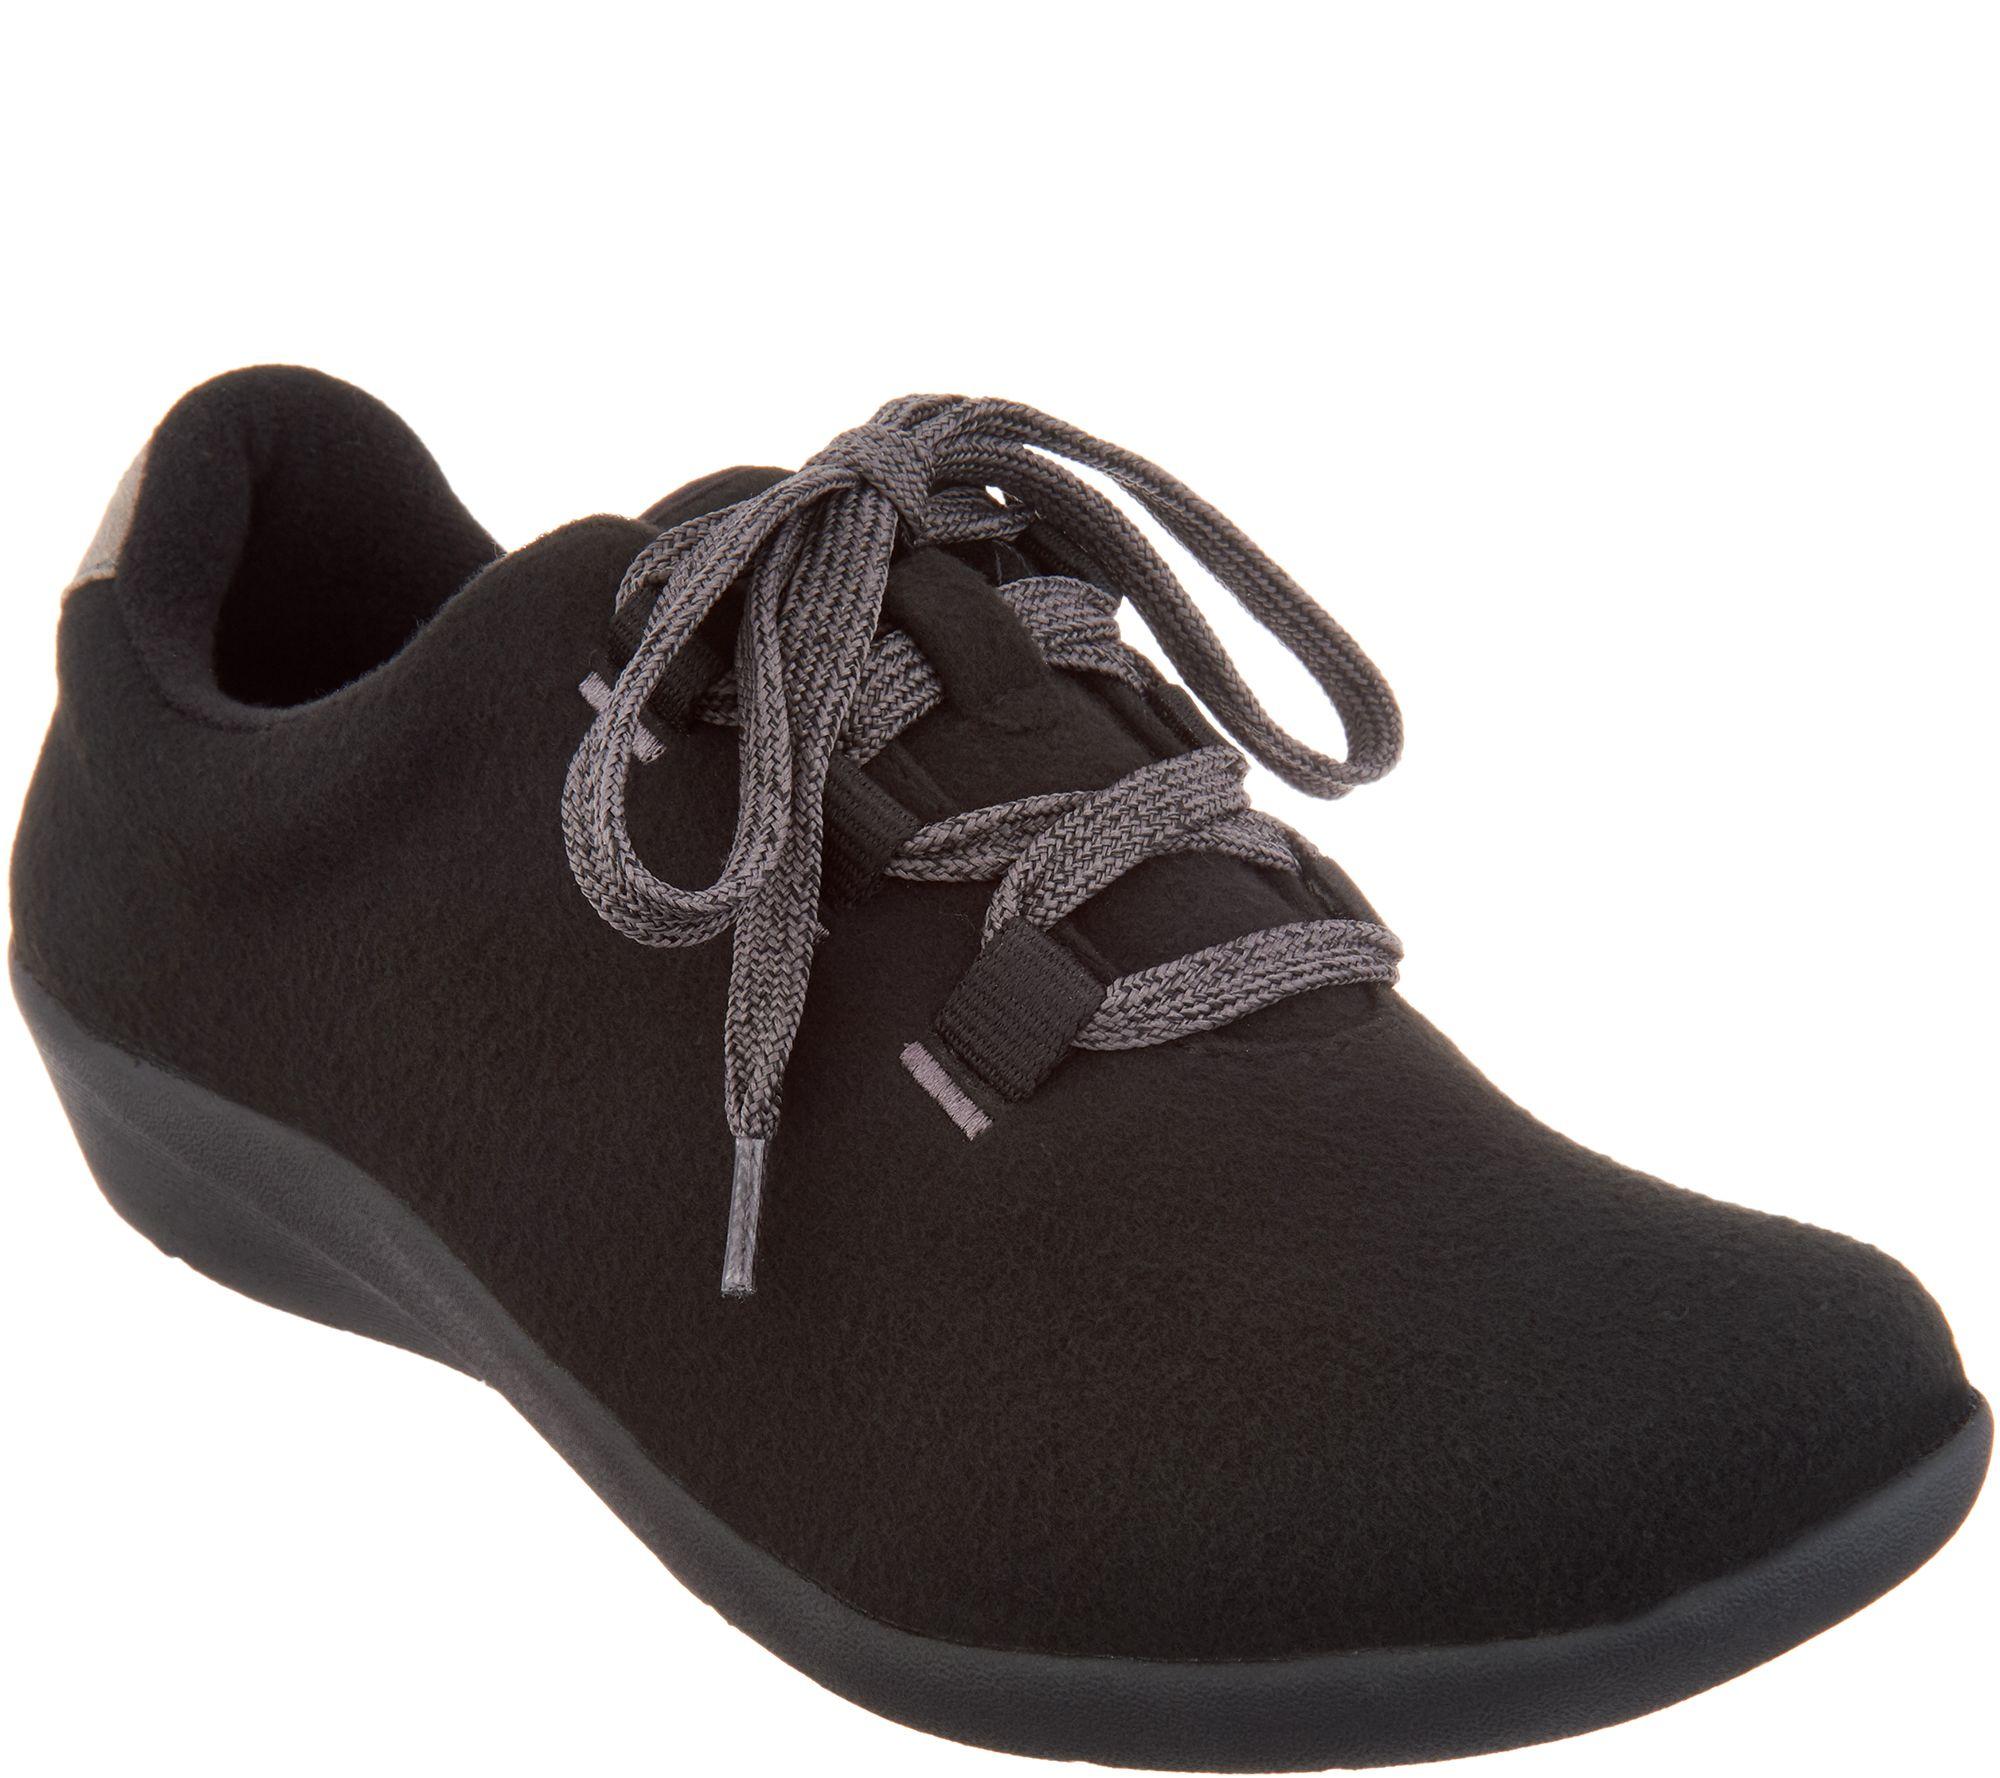 3b7172fe9595 Earth Origins Casual Lace-up Sneakers - Loretta - Page 1 — QVC.com